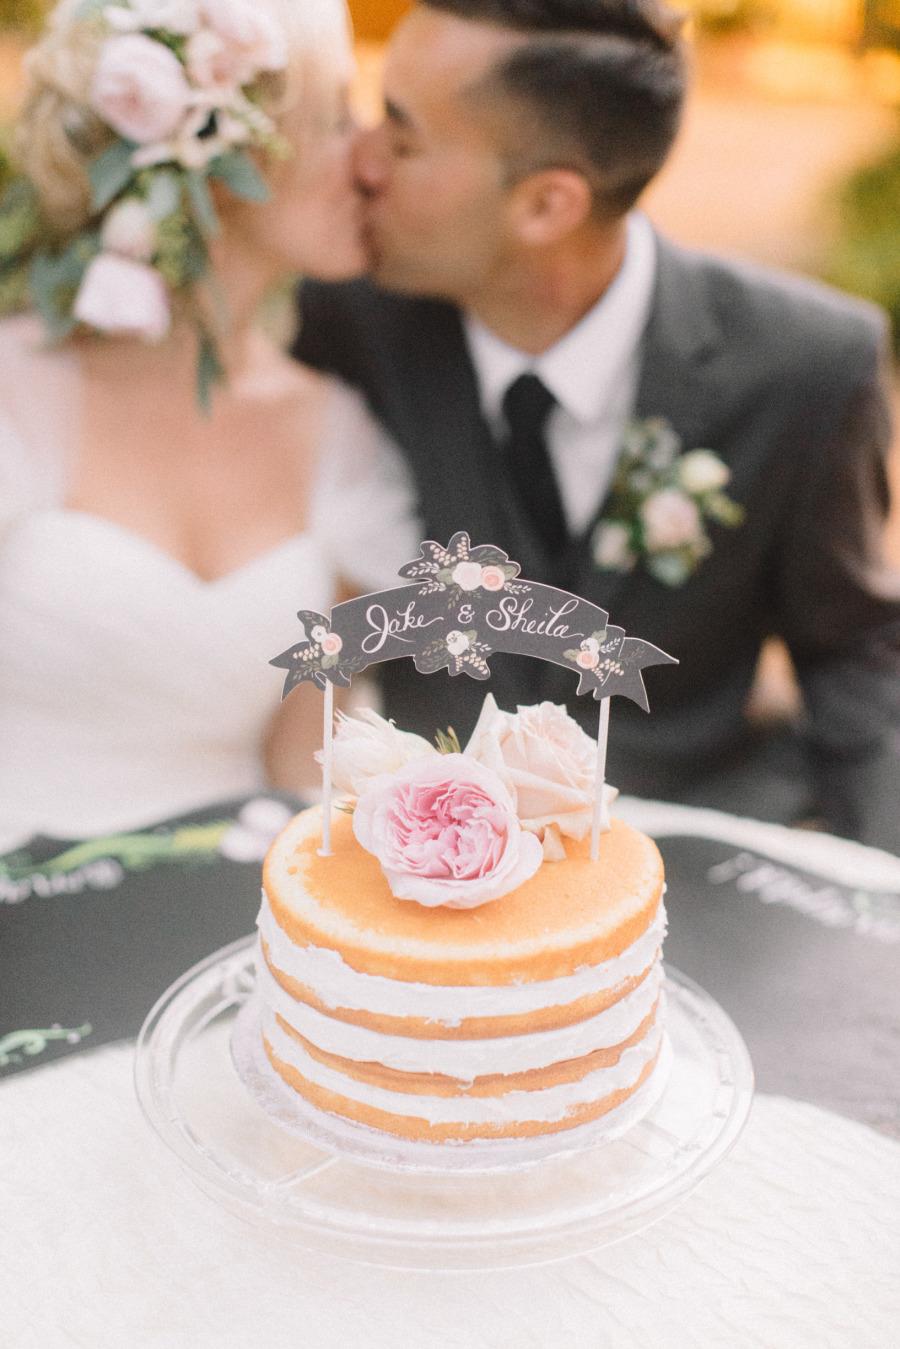 Summer Wedding Cakes Photos,summer wedding cake ideas